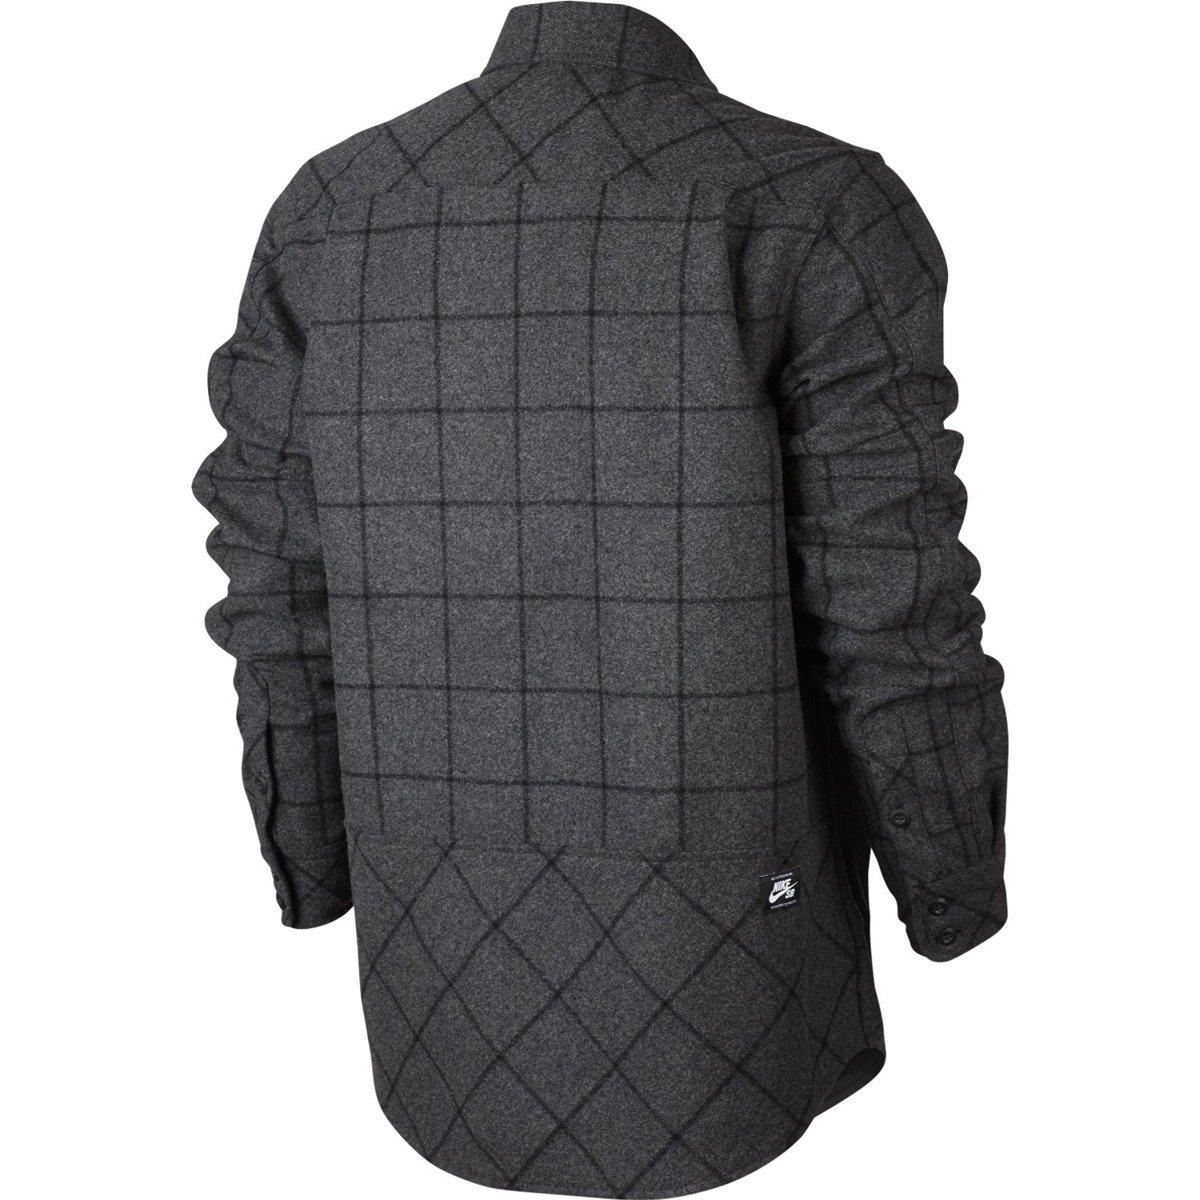 9c6a864b090ba ... Koszula Nike SB Holgate Yarn Dye Wool Long-Sleeve Shirt Buffalo  Charcoal Heathr Click to zoom